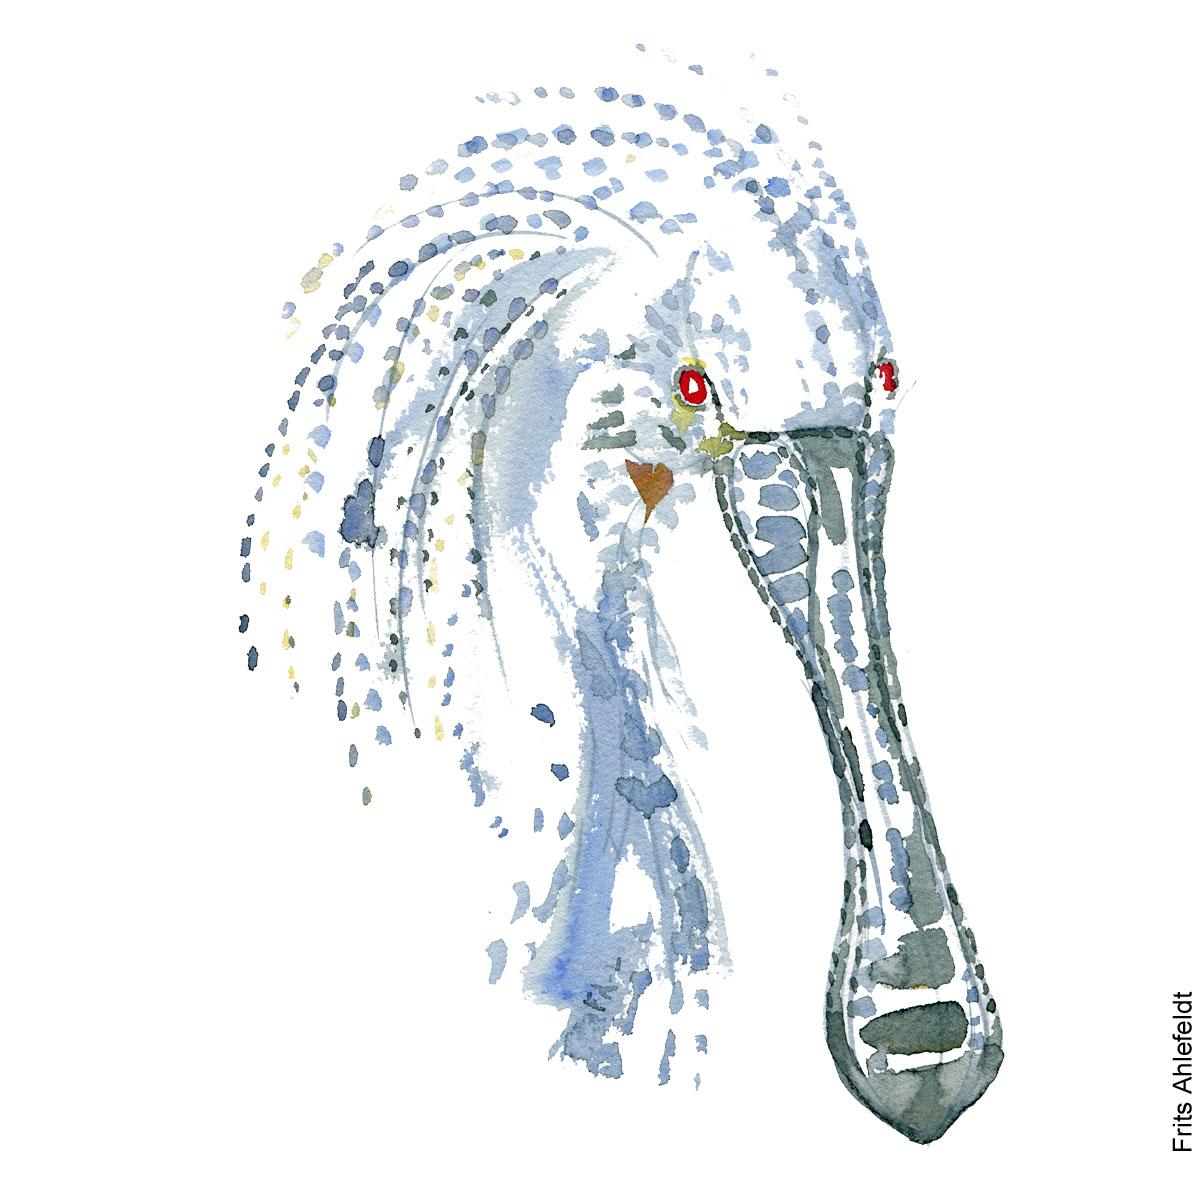 Skestork - Spoonbill bird watercolor painting. Artwork by Frits Ahlefeldt. Fugle akvarel